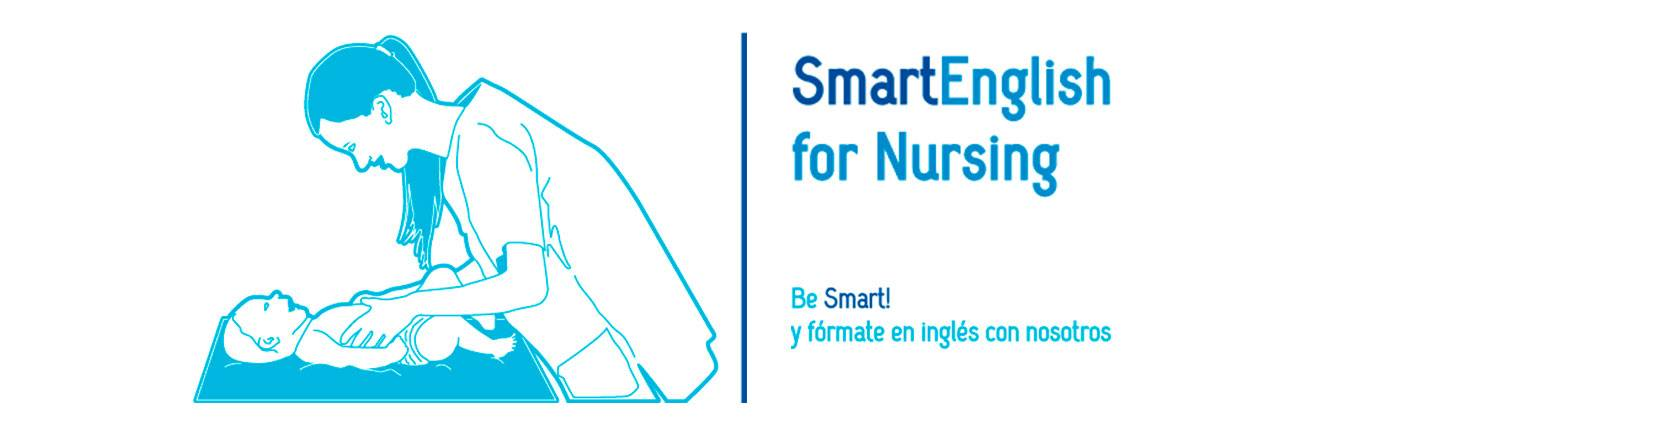 Inglés para enfermería